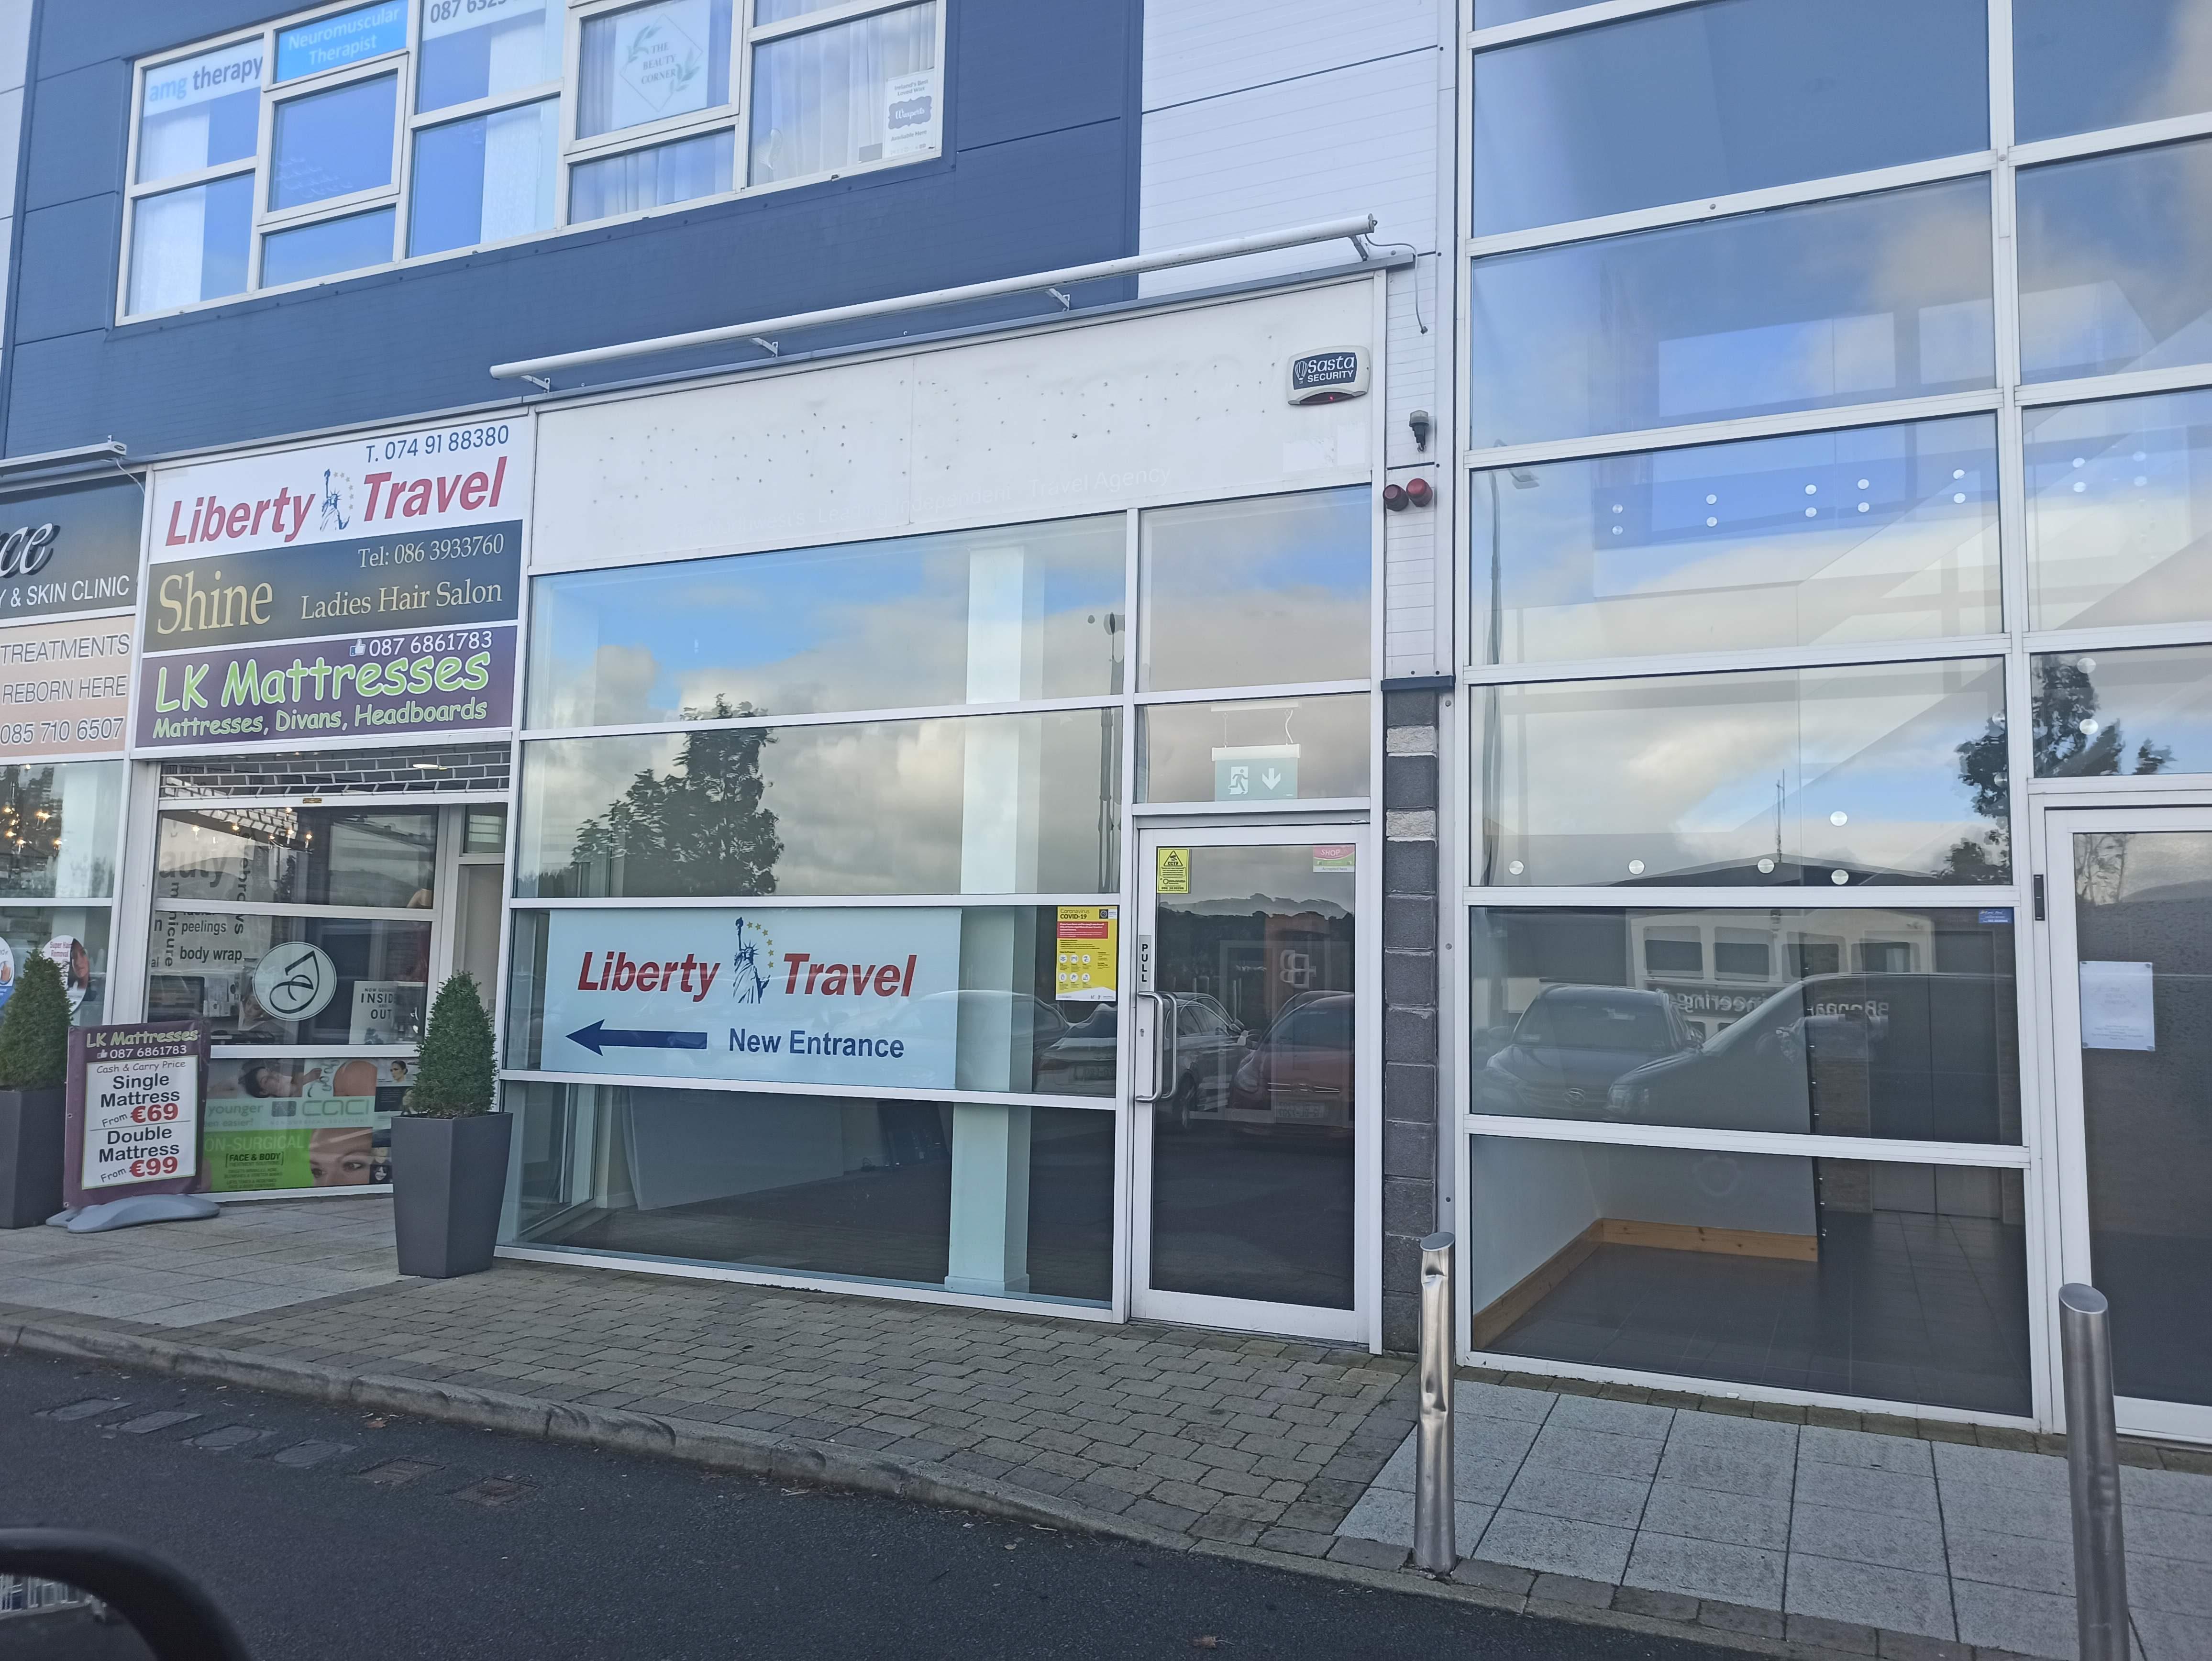 Unit 3B Riverside Retail Park, Letterkenny, Co. Donegal